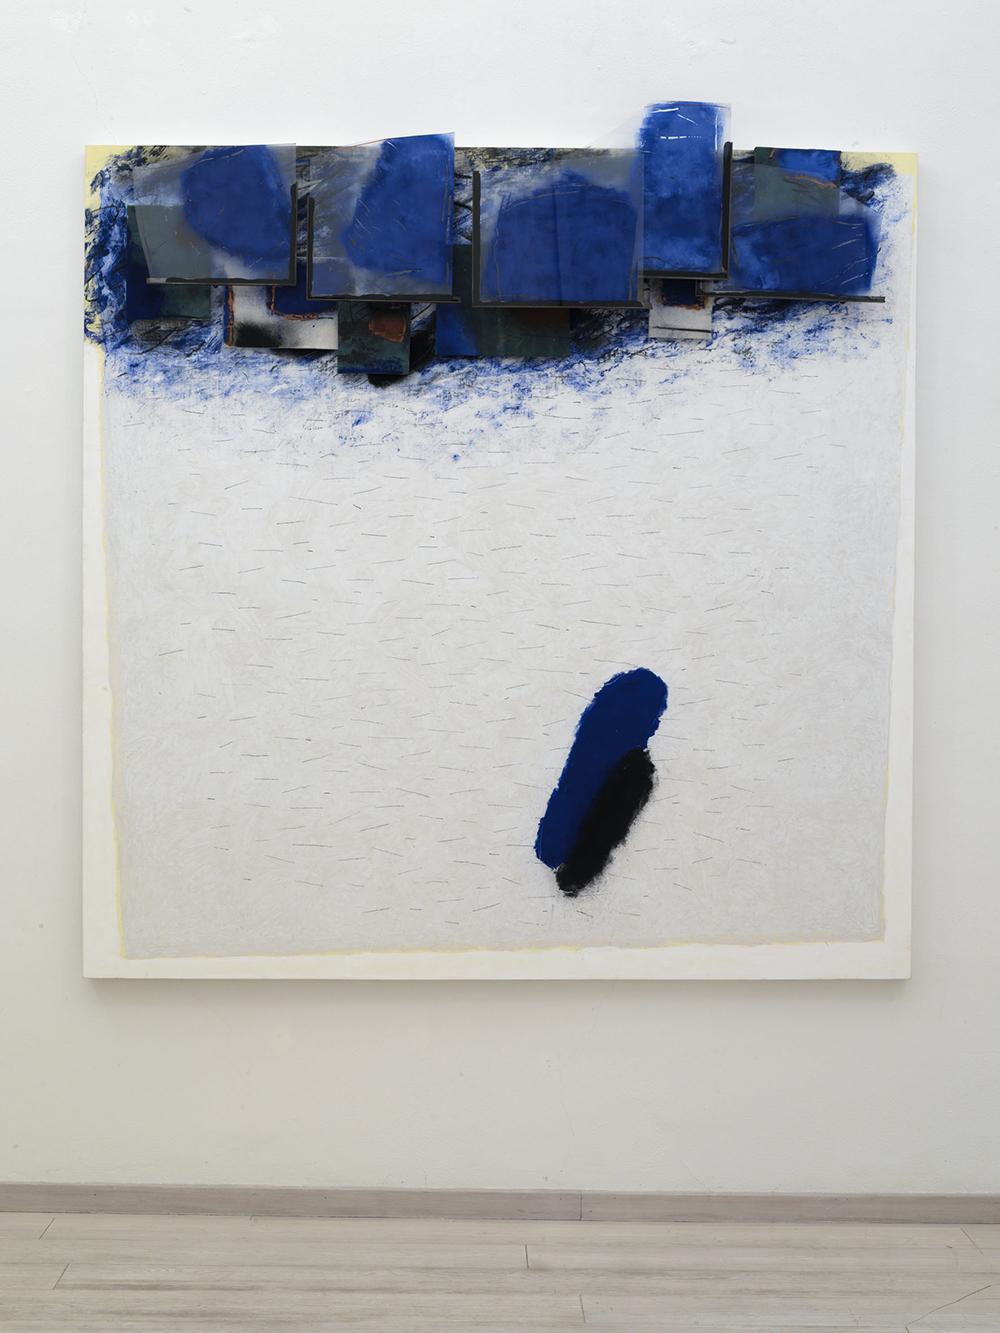 Apeiron, 2005, tecnica mista su tela, cm 205x200